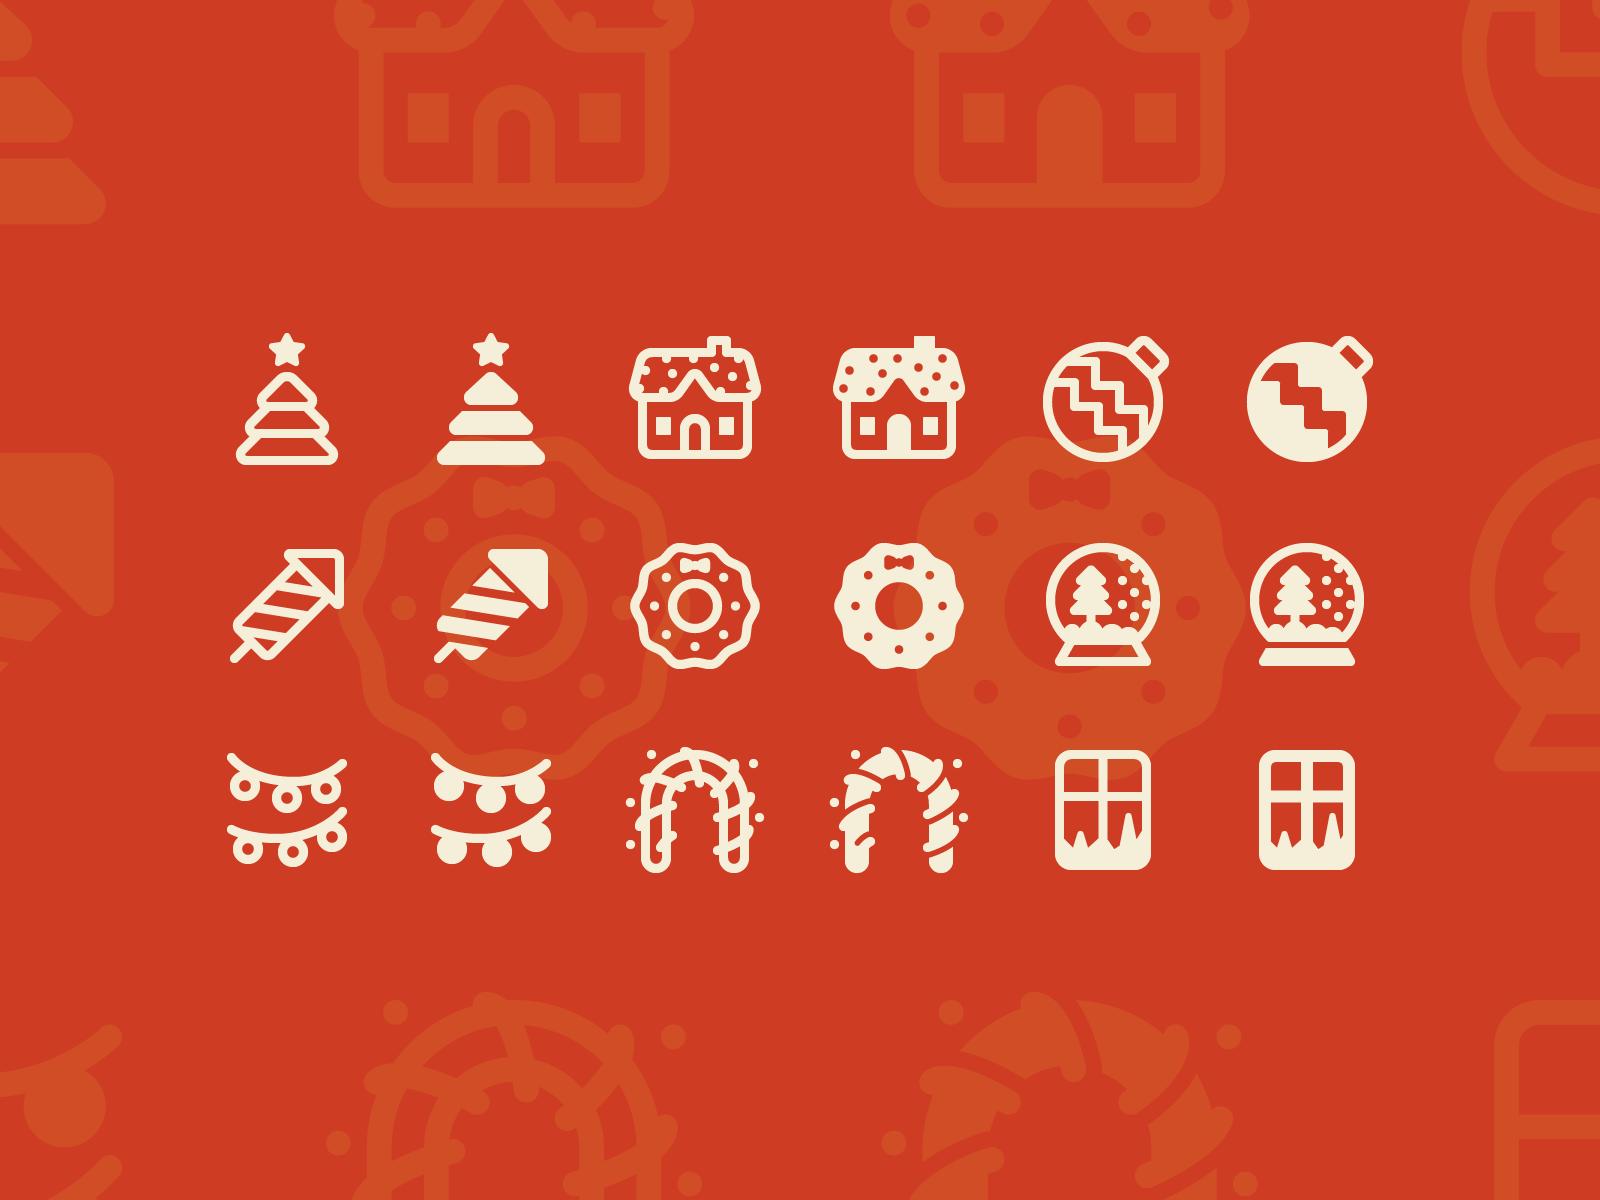 icons8 christmas illustration icons fluent system